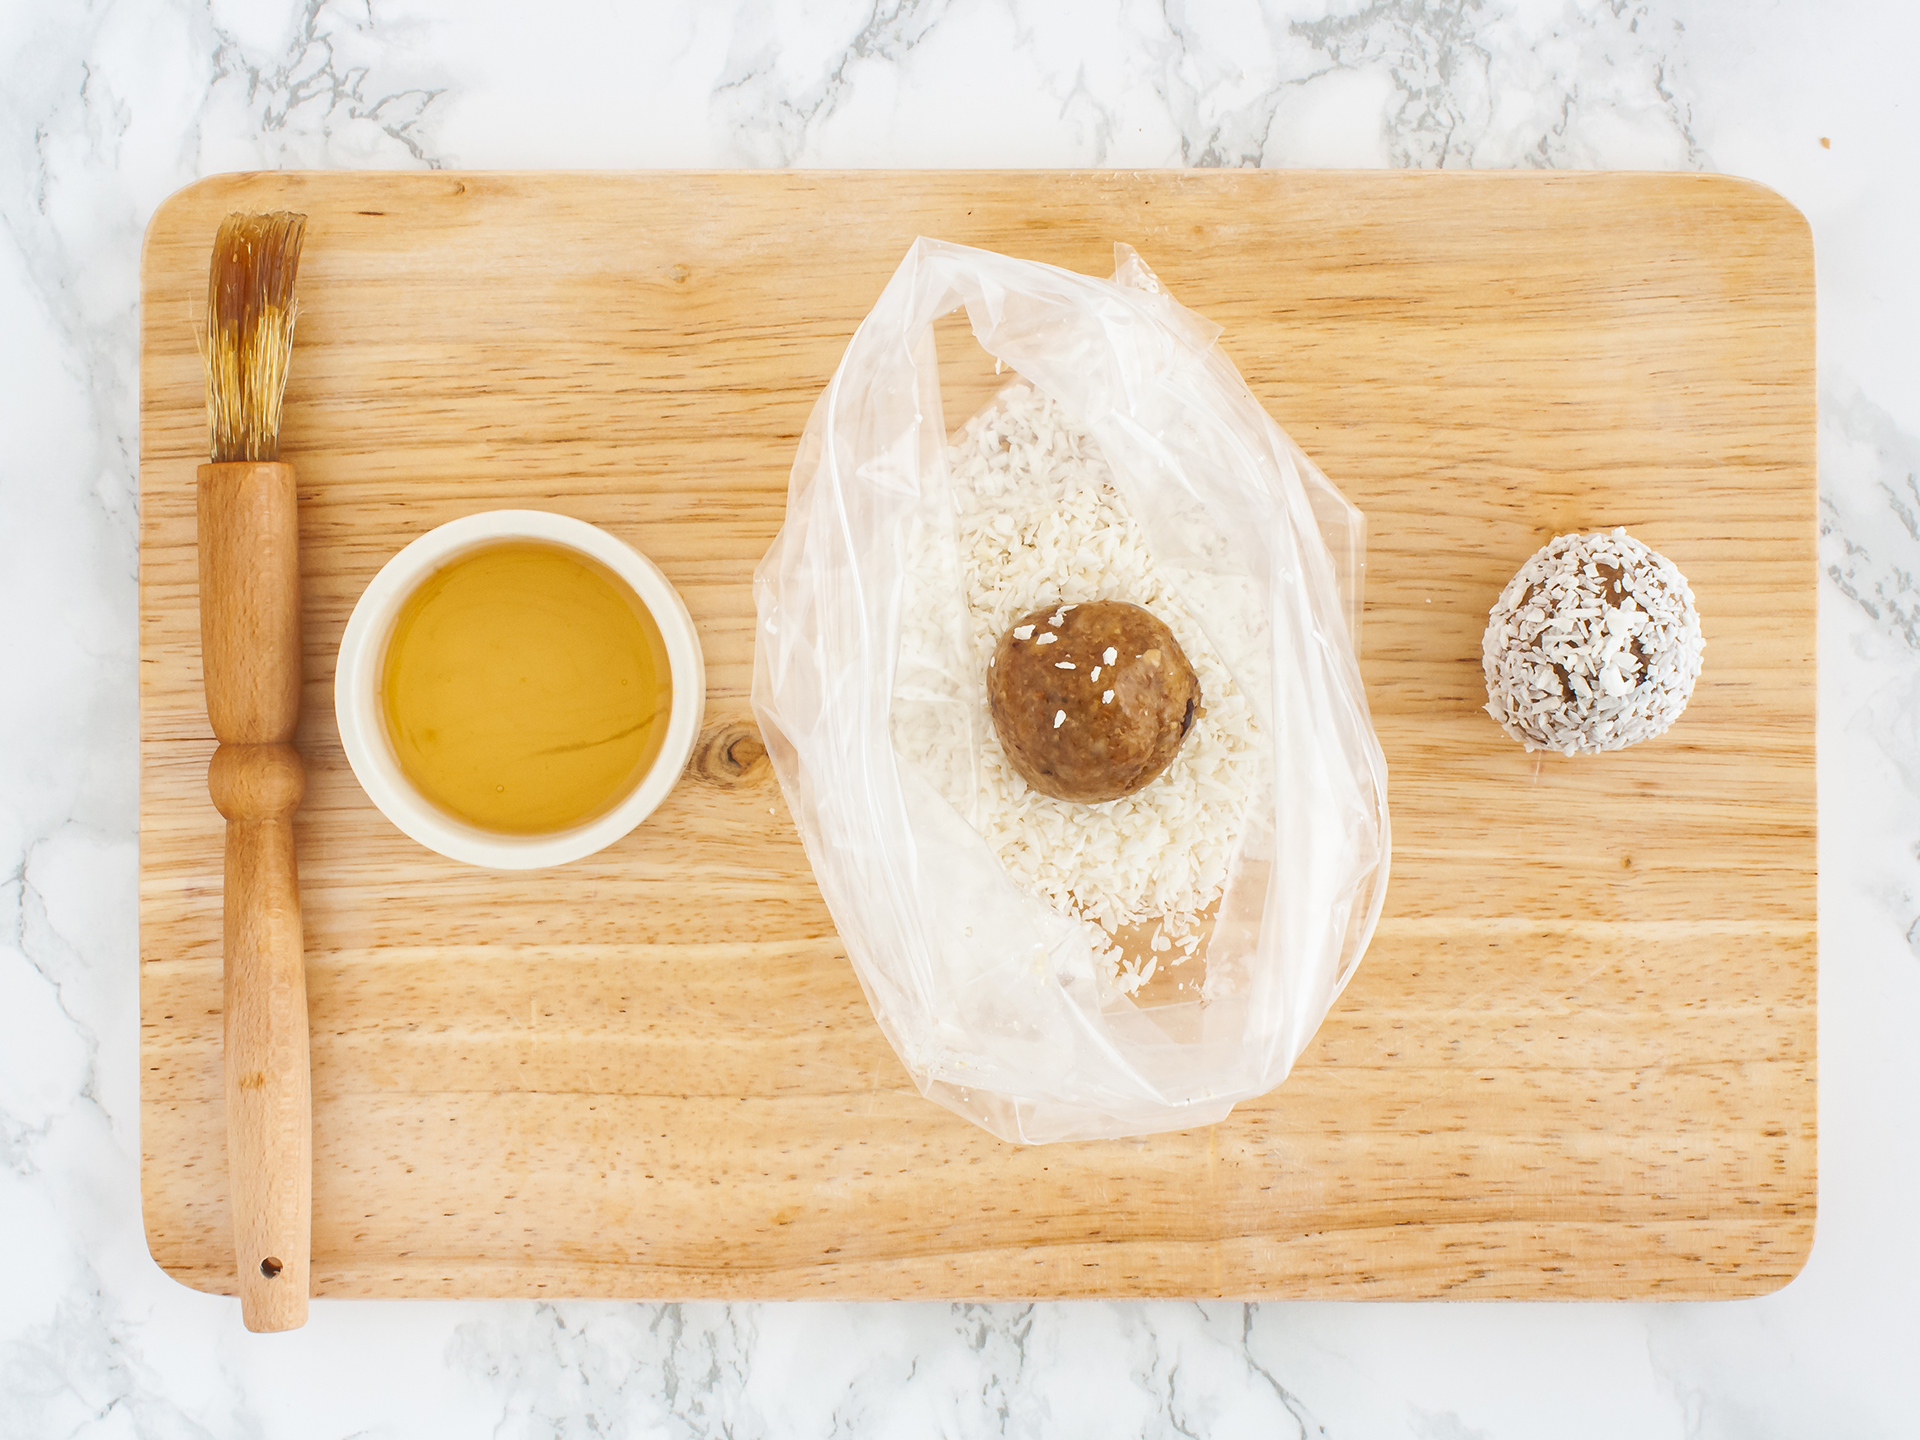 Step 3.2 of Chocolate and Coconut Cashew Truffles Recipe